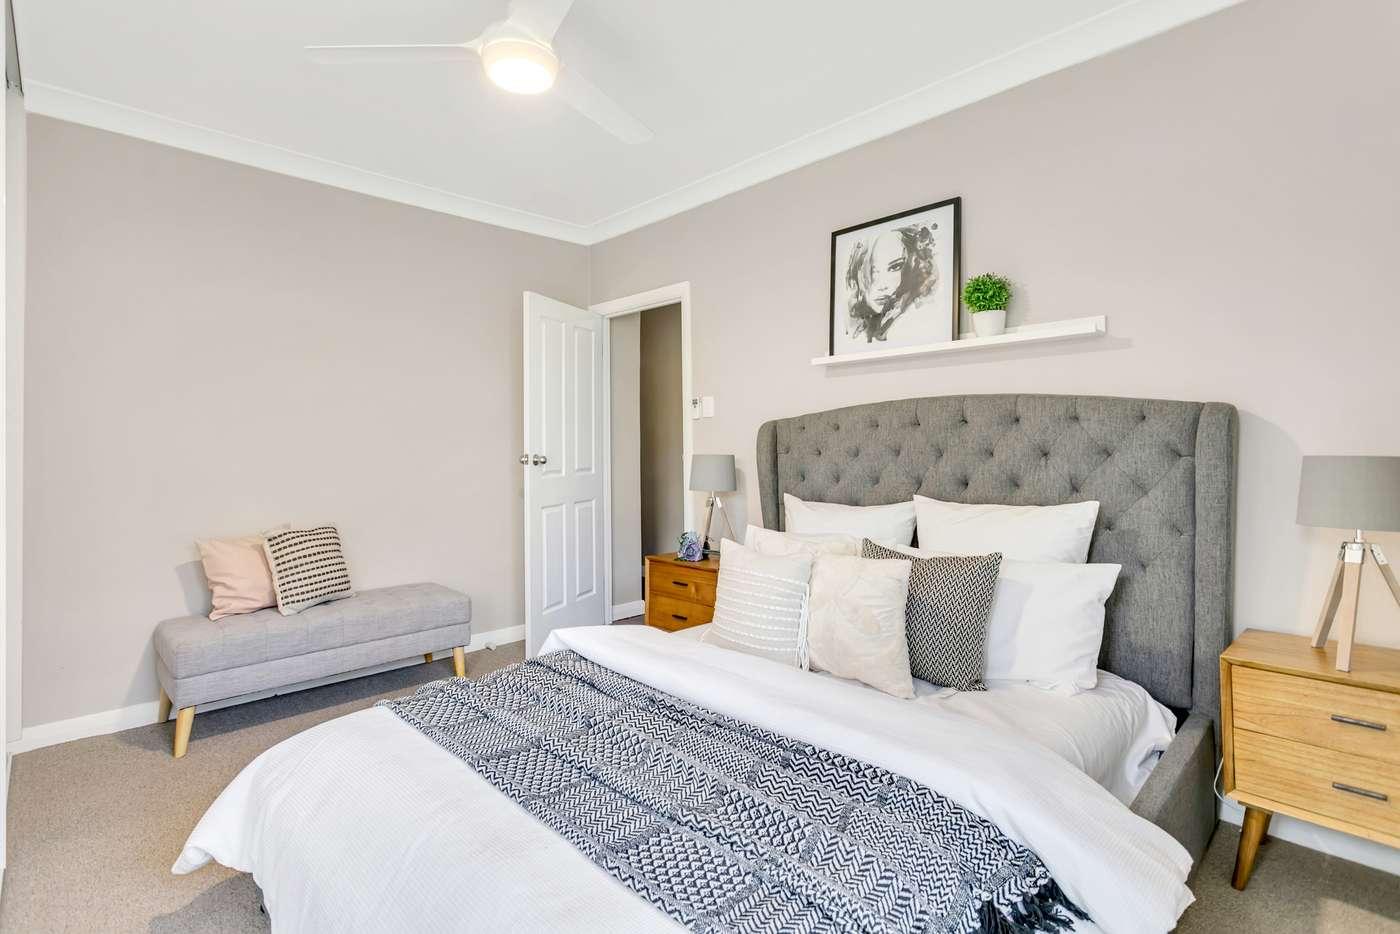 Fifth view of Homely house listing, 2 Louisa Street, Morphett Vale SA 5162